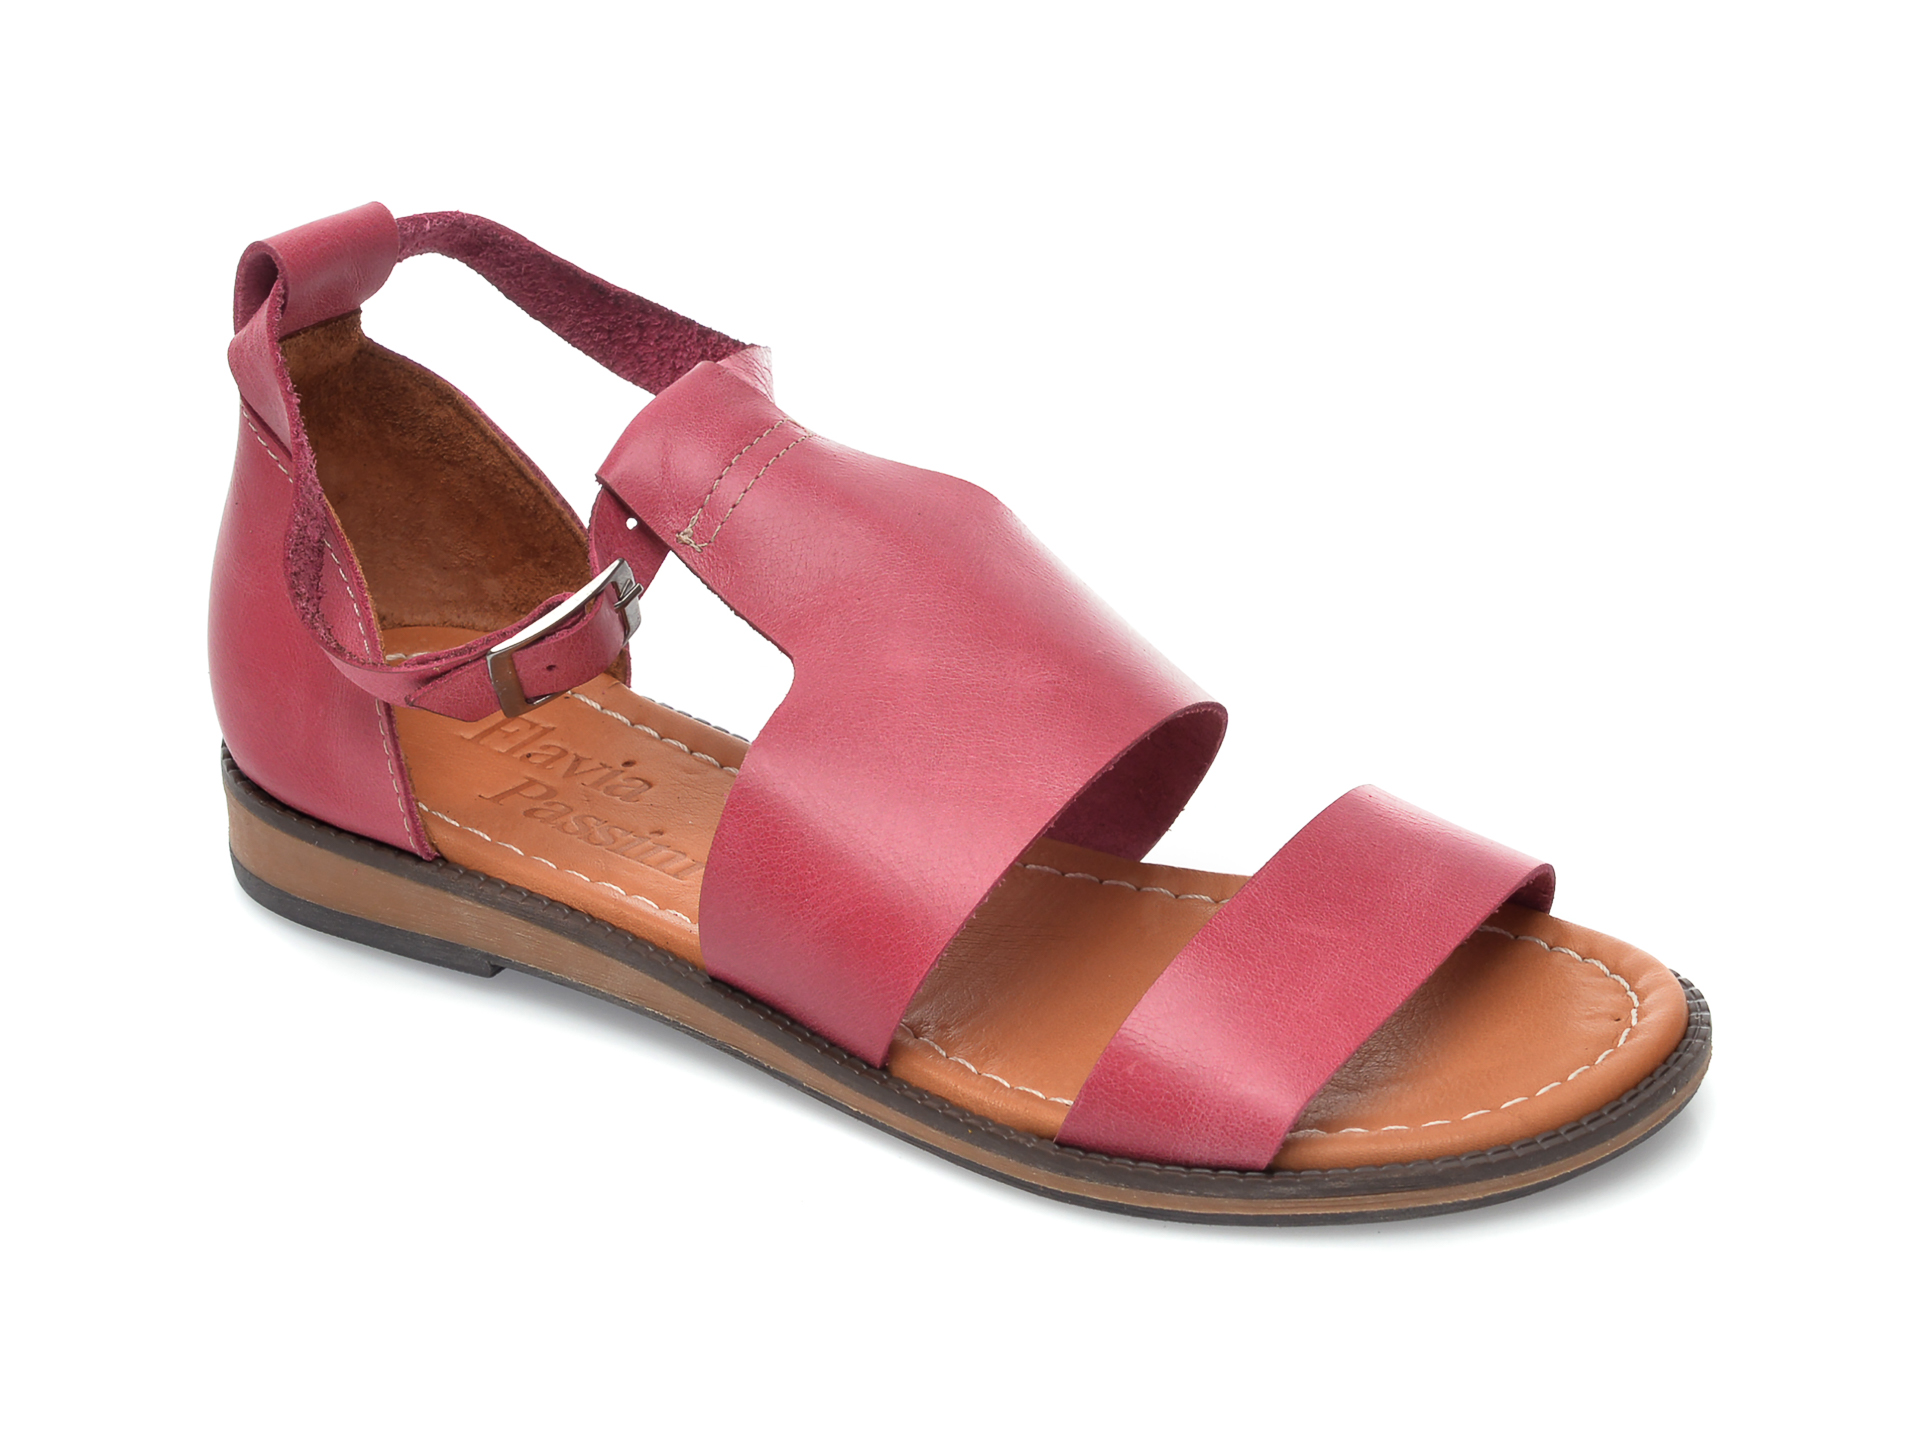 Sandale FLAVIA PASSINI roz, 1004, din piele naturala imagine otter.ro 2021